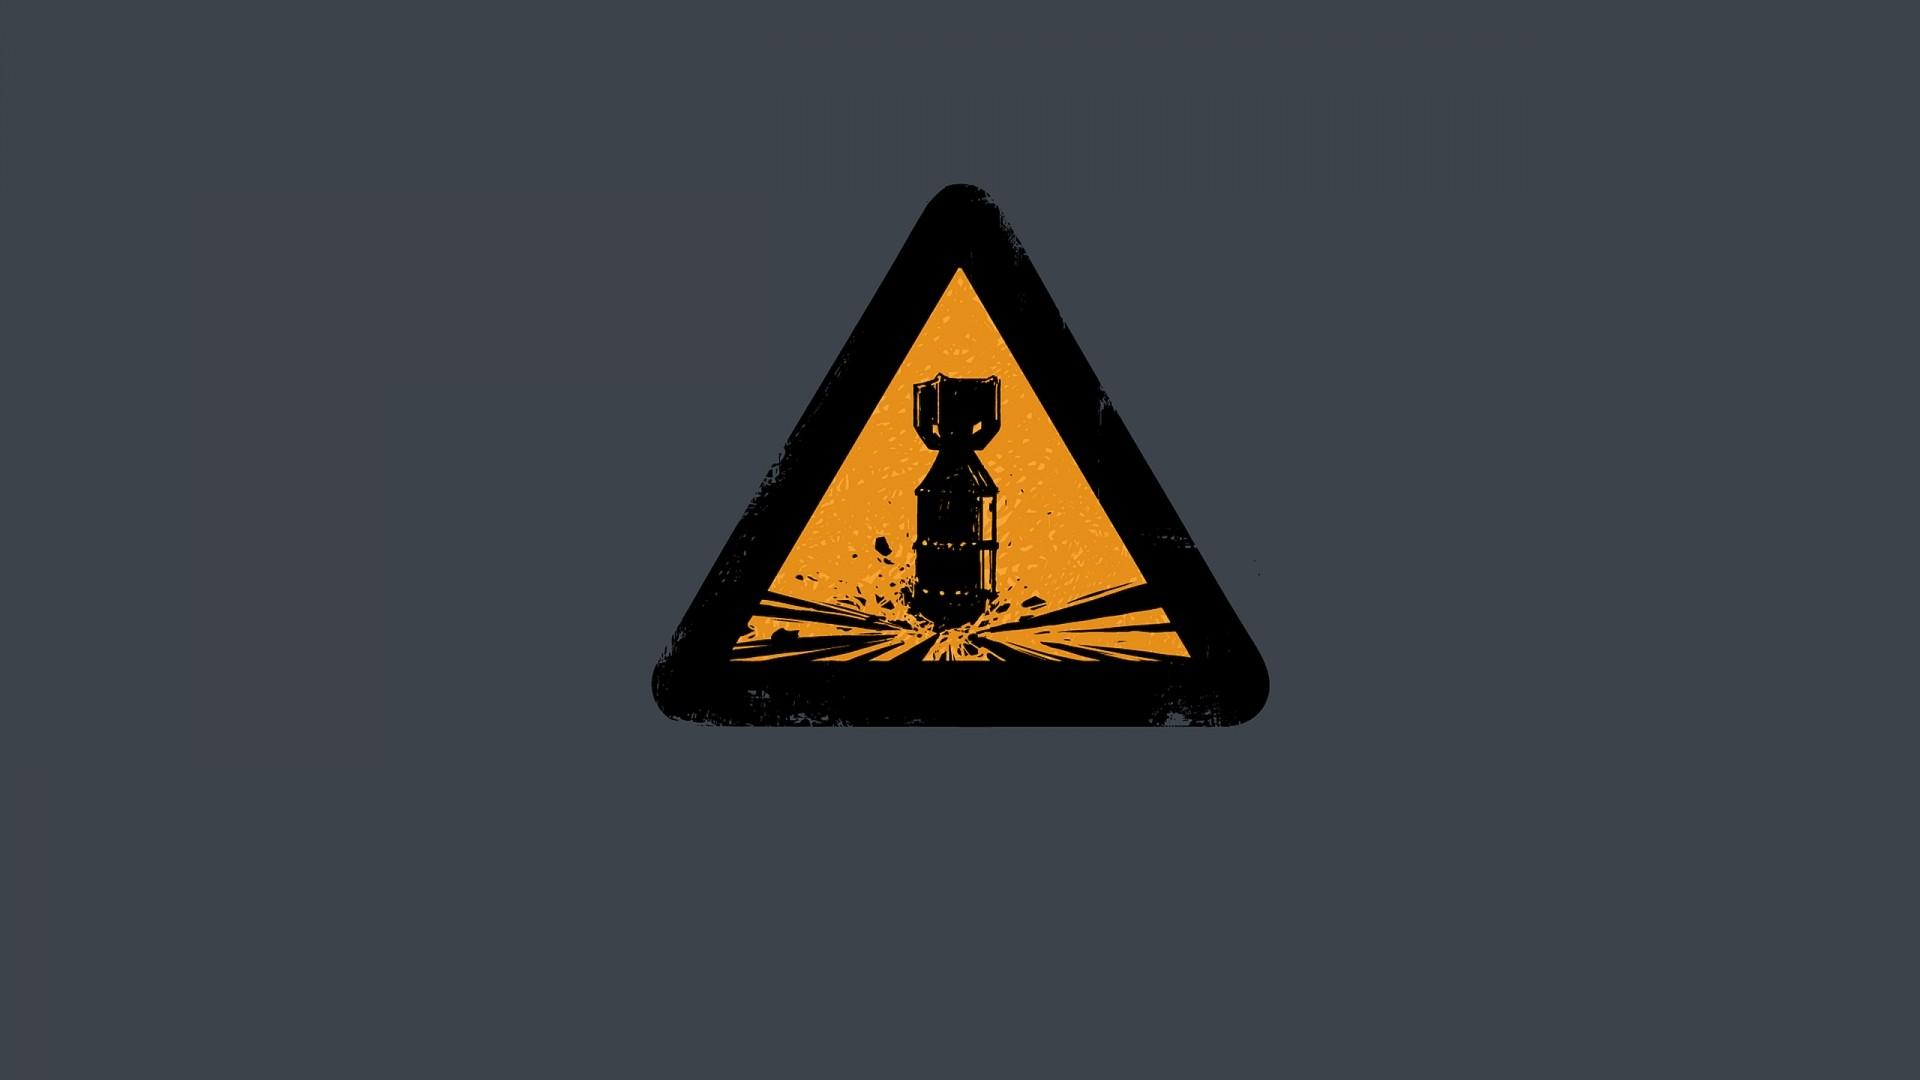 Danger Background Wallpaper